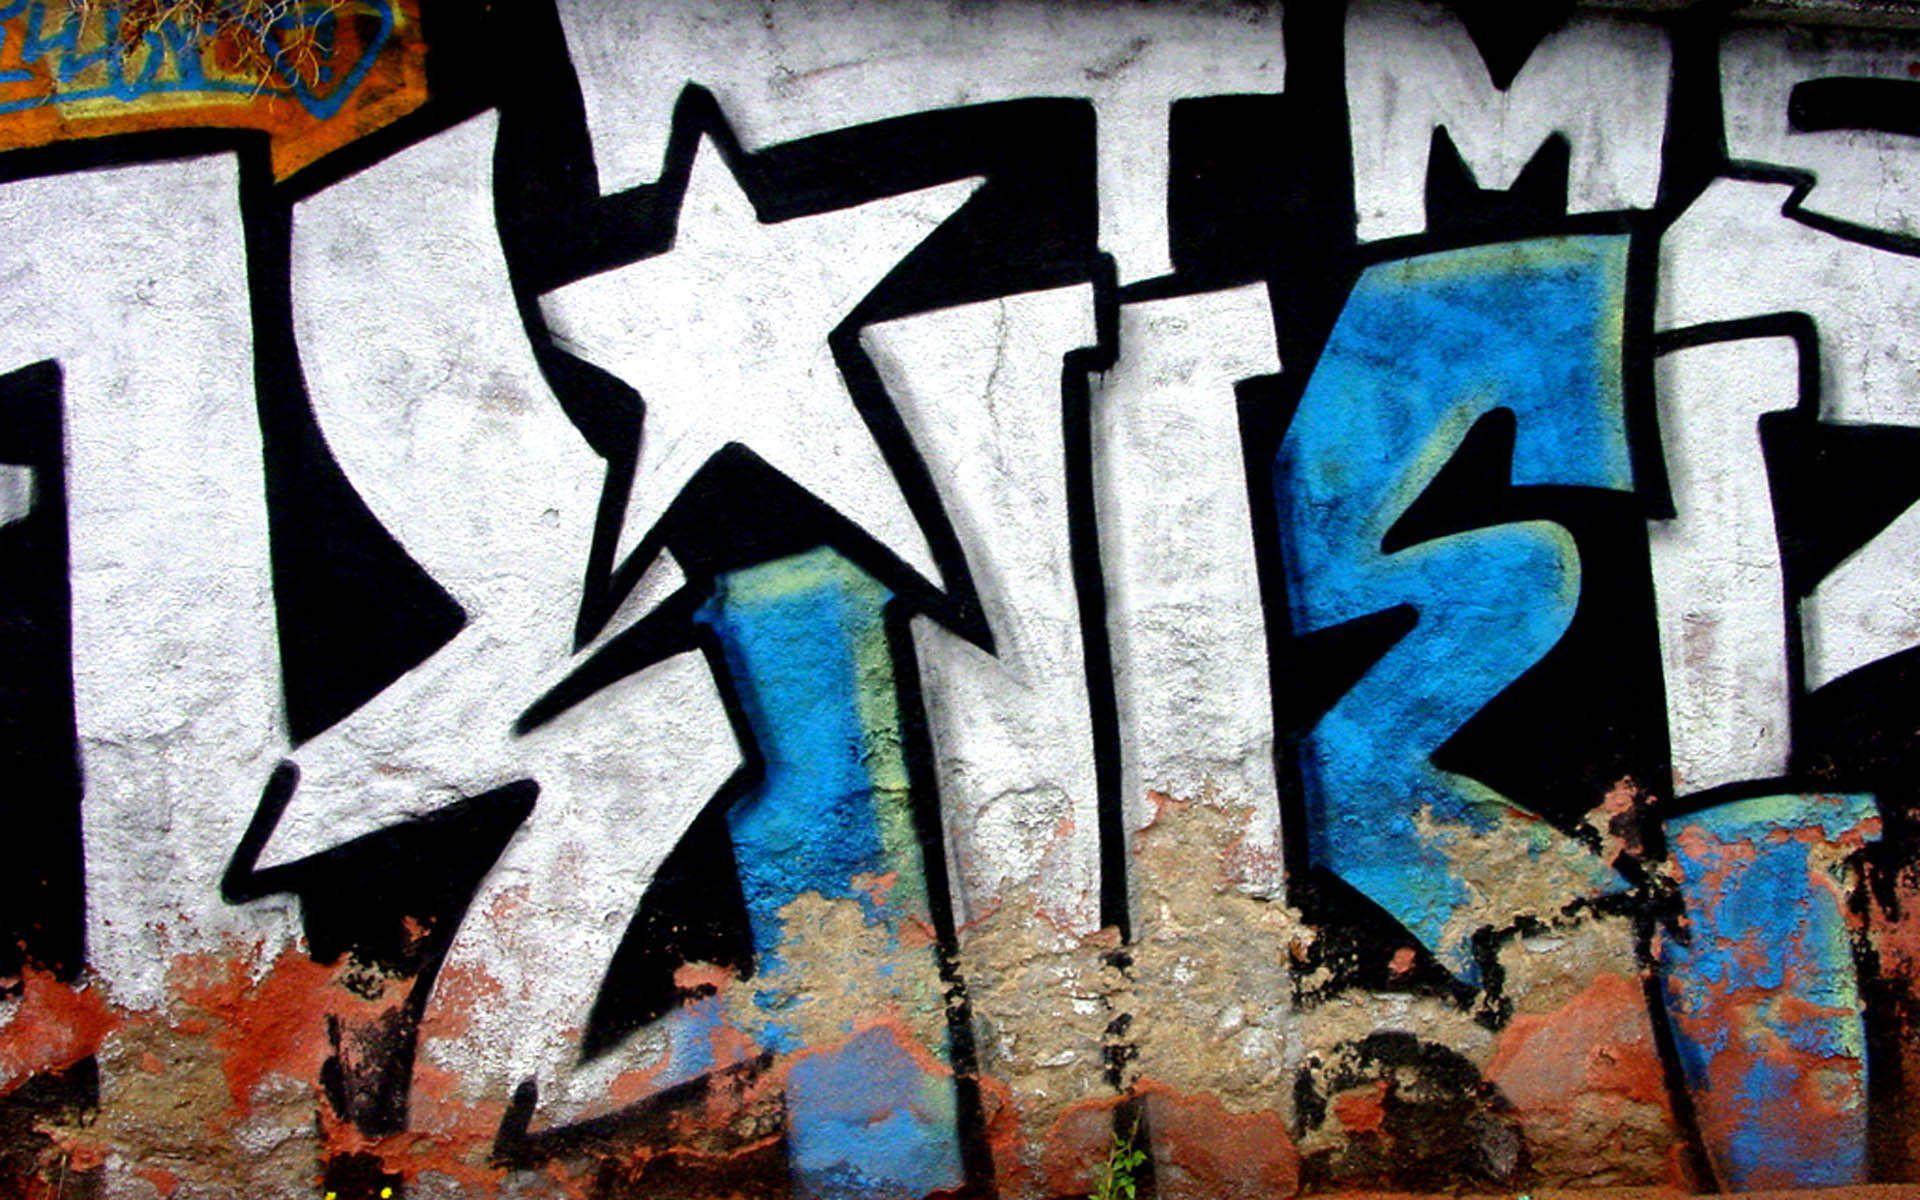 Graffiti Hd Wallpapers Backgrounds Wallpaper